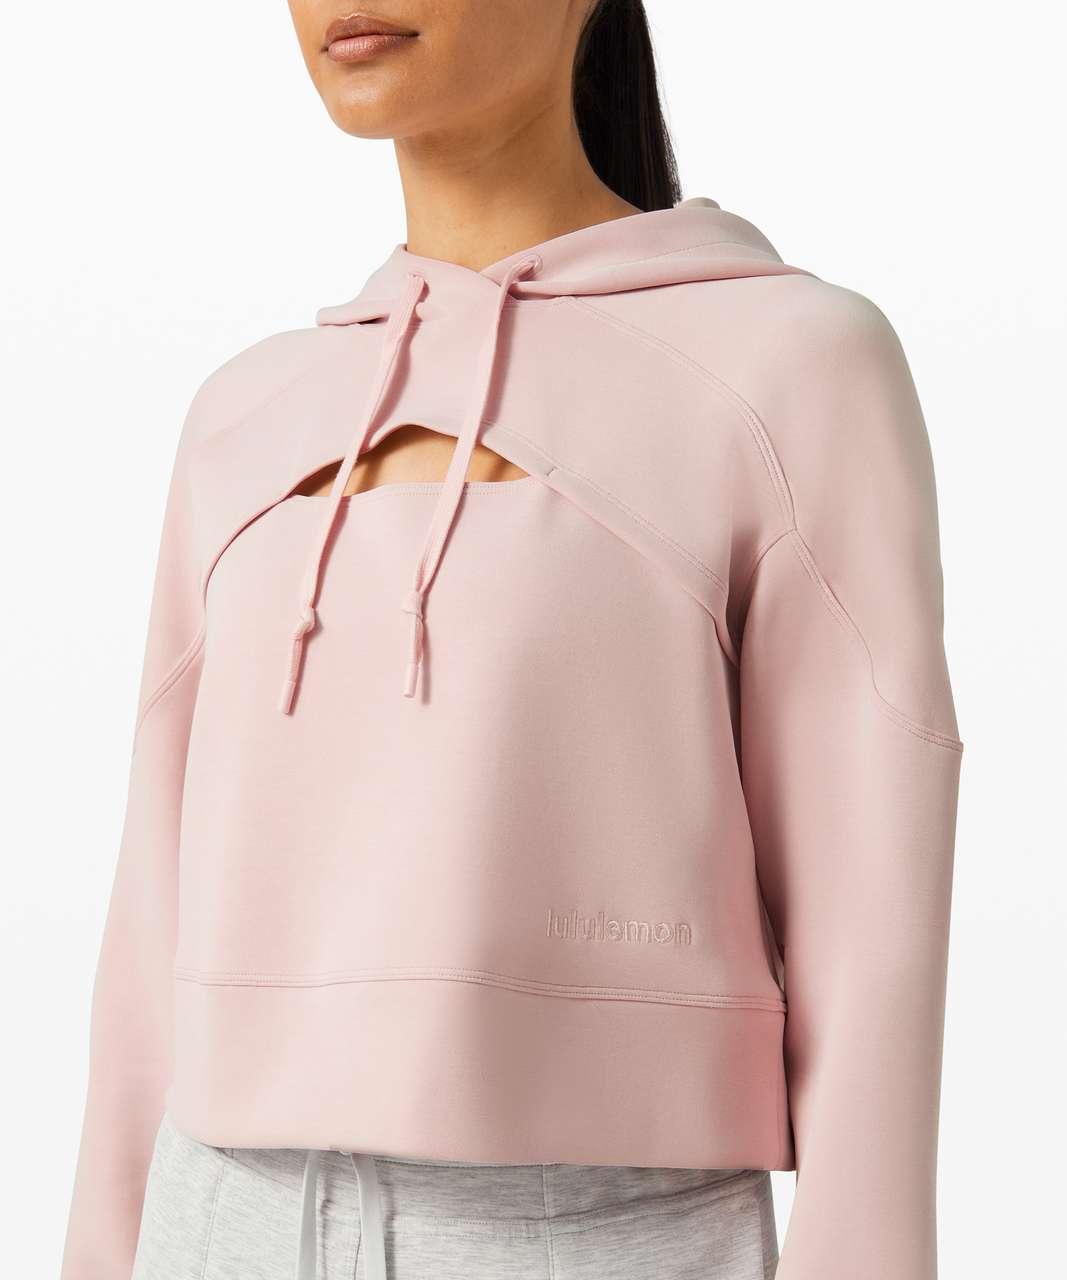 Lululemon Get Centred Crop Hoodie - Misty Pink / Misty Pink